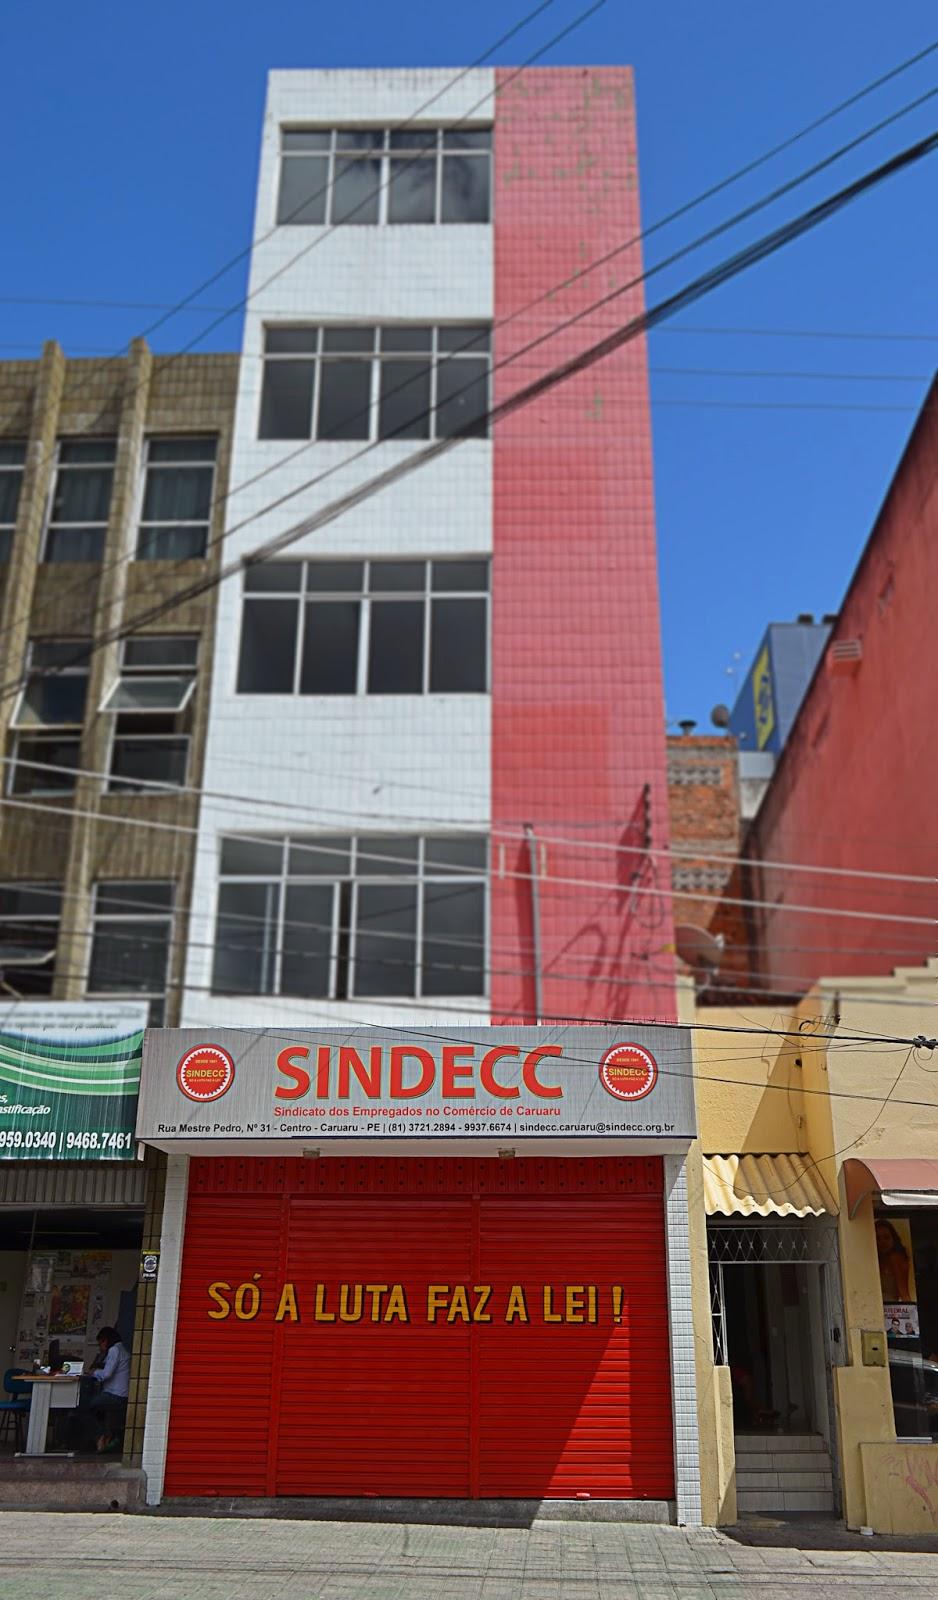 26 de setembro aniversário do SINDECC.